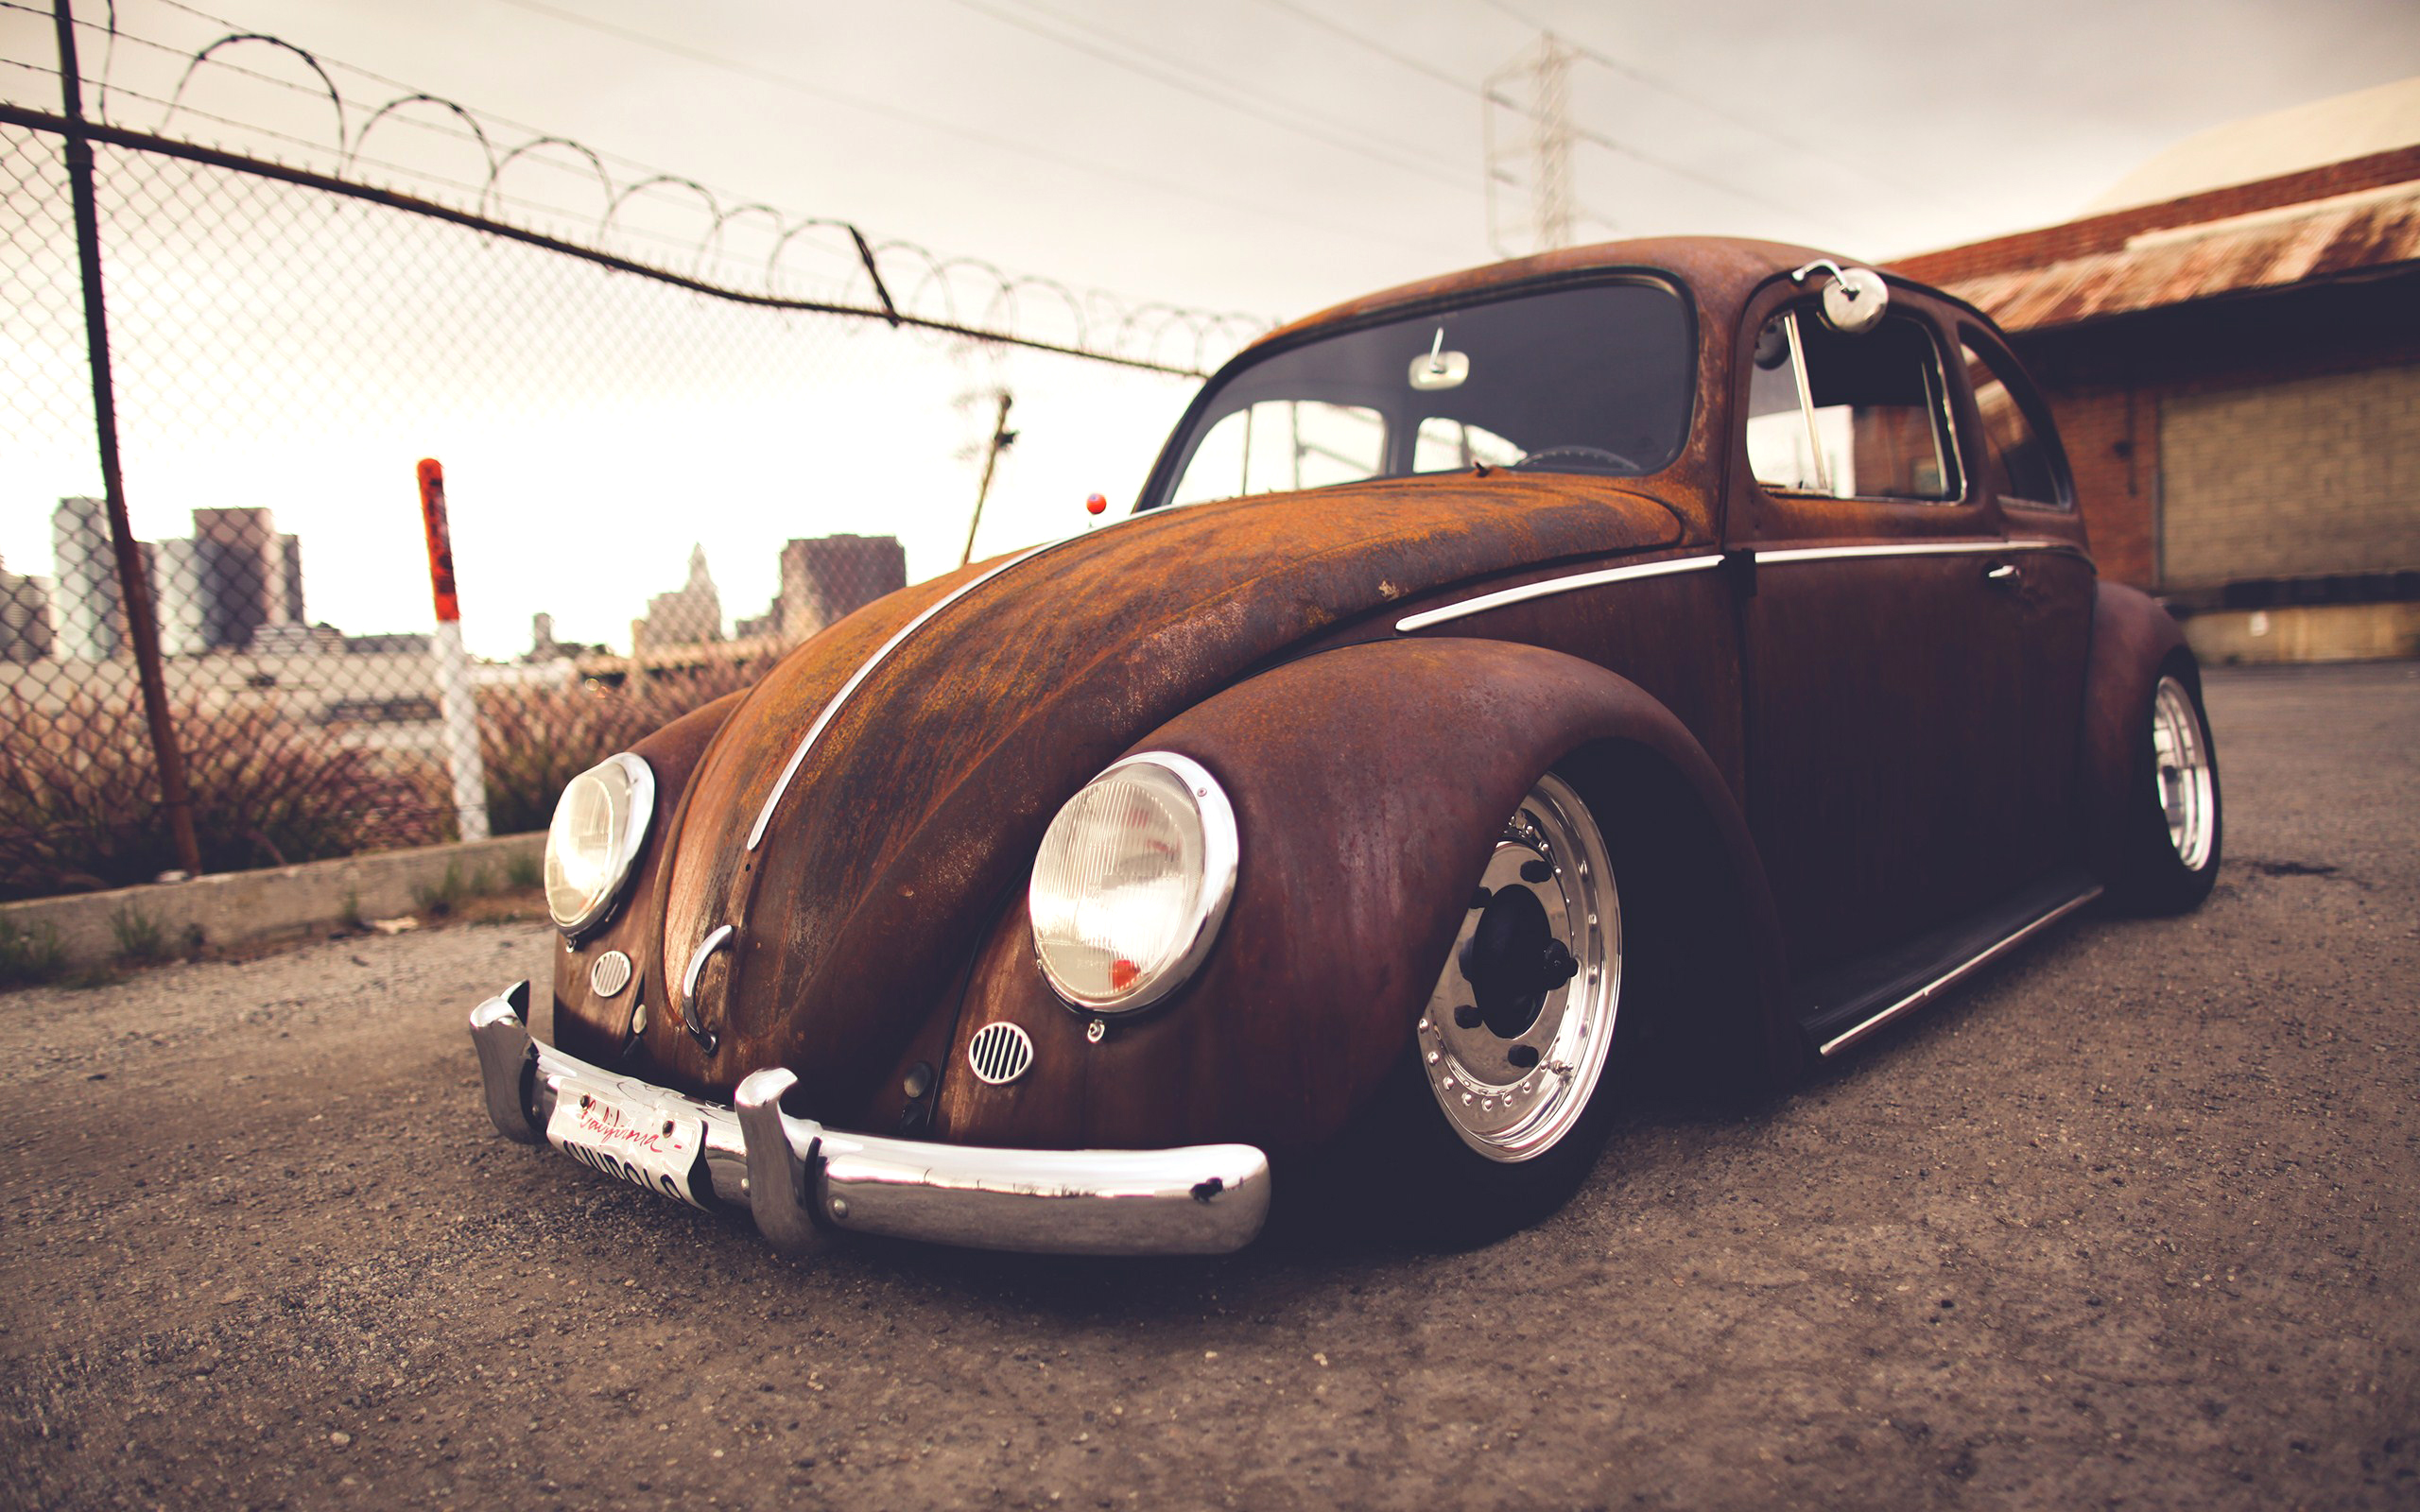 volkswagen bug classic car wallpaper 2560x1600